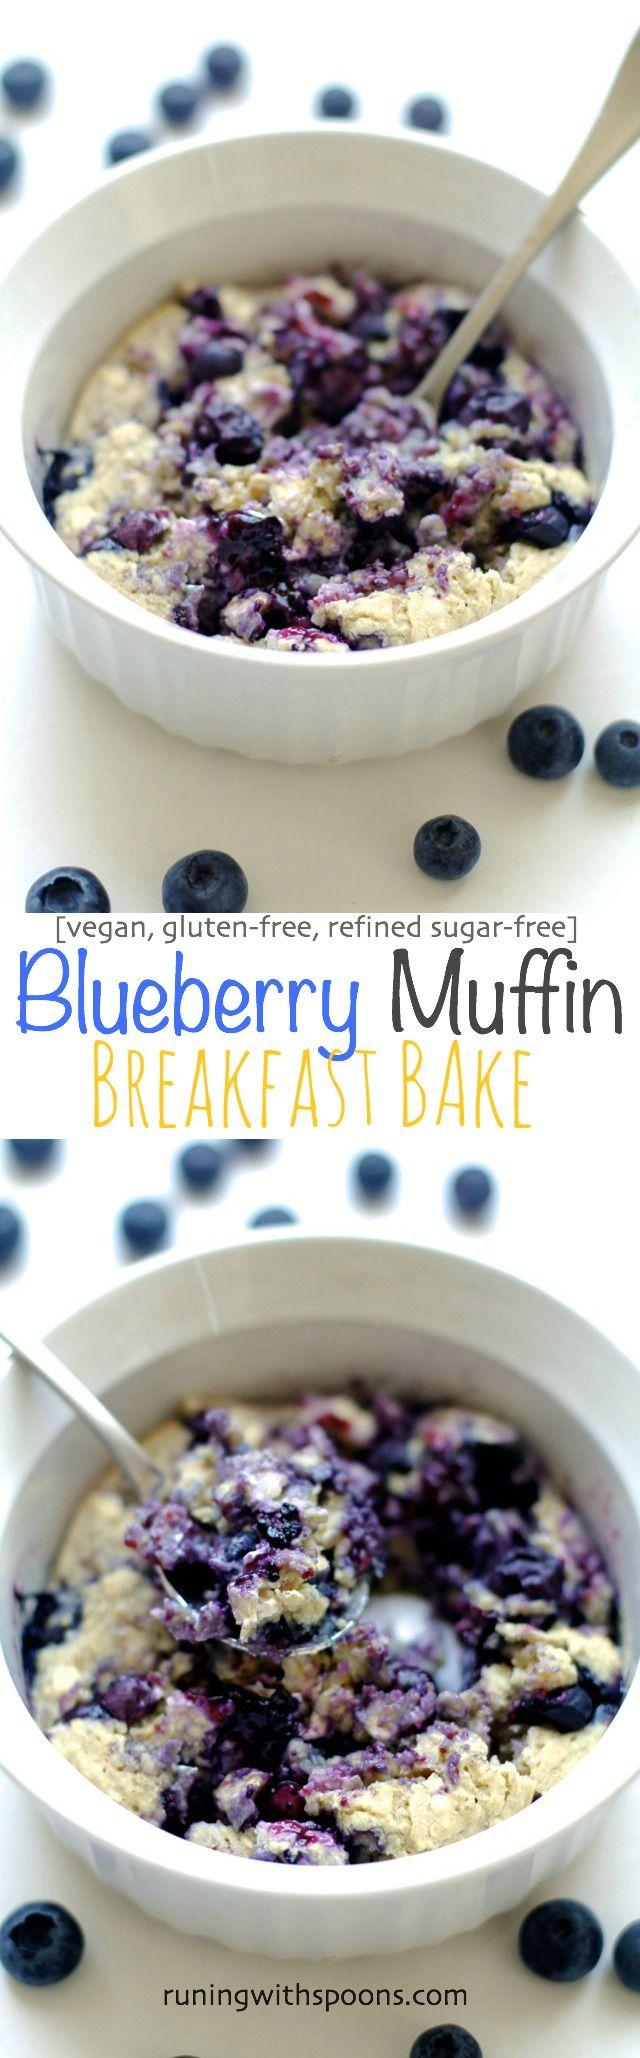 Blueberry Muffin Breakfast Bake -- tastes just like a blueberry muffin!    runningwithspoons.com #vegan #glutenfree #breakfast #recipe